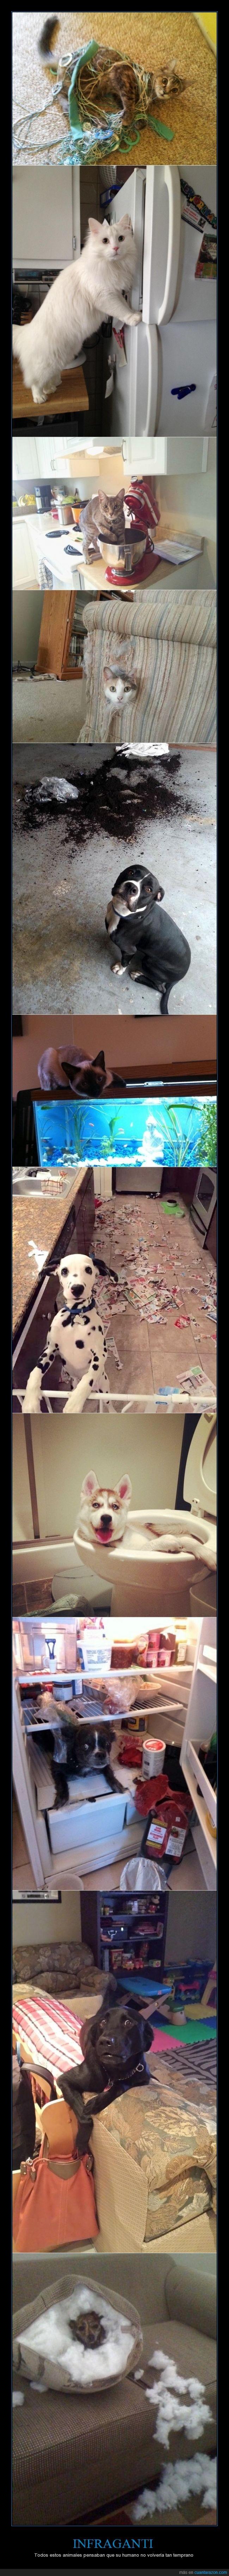 Gatos,infraganti,perros,pillar,remordimiento,romper,roto,travesura,travesuras